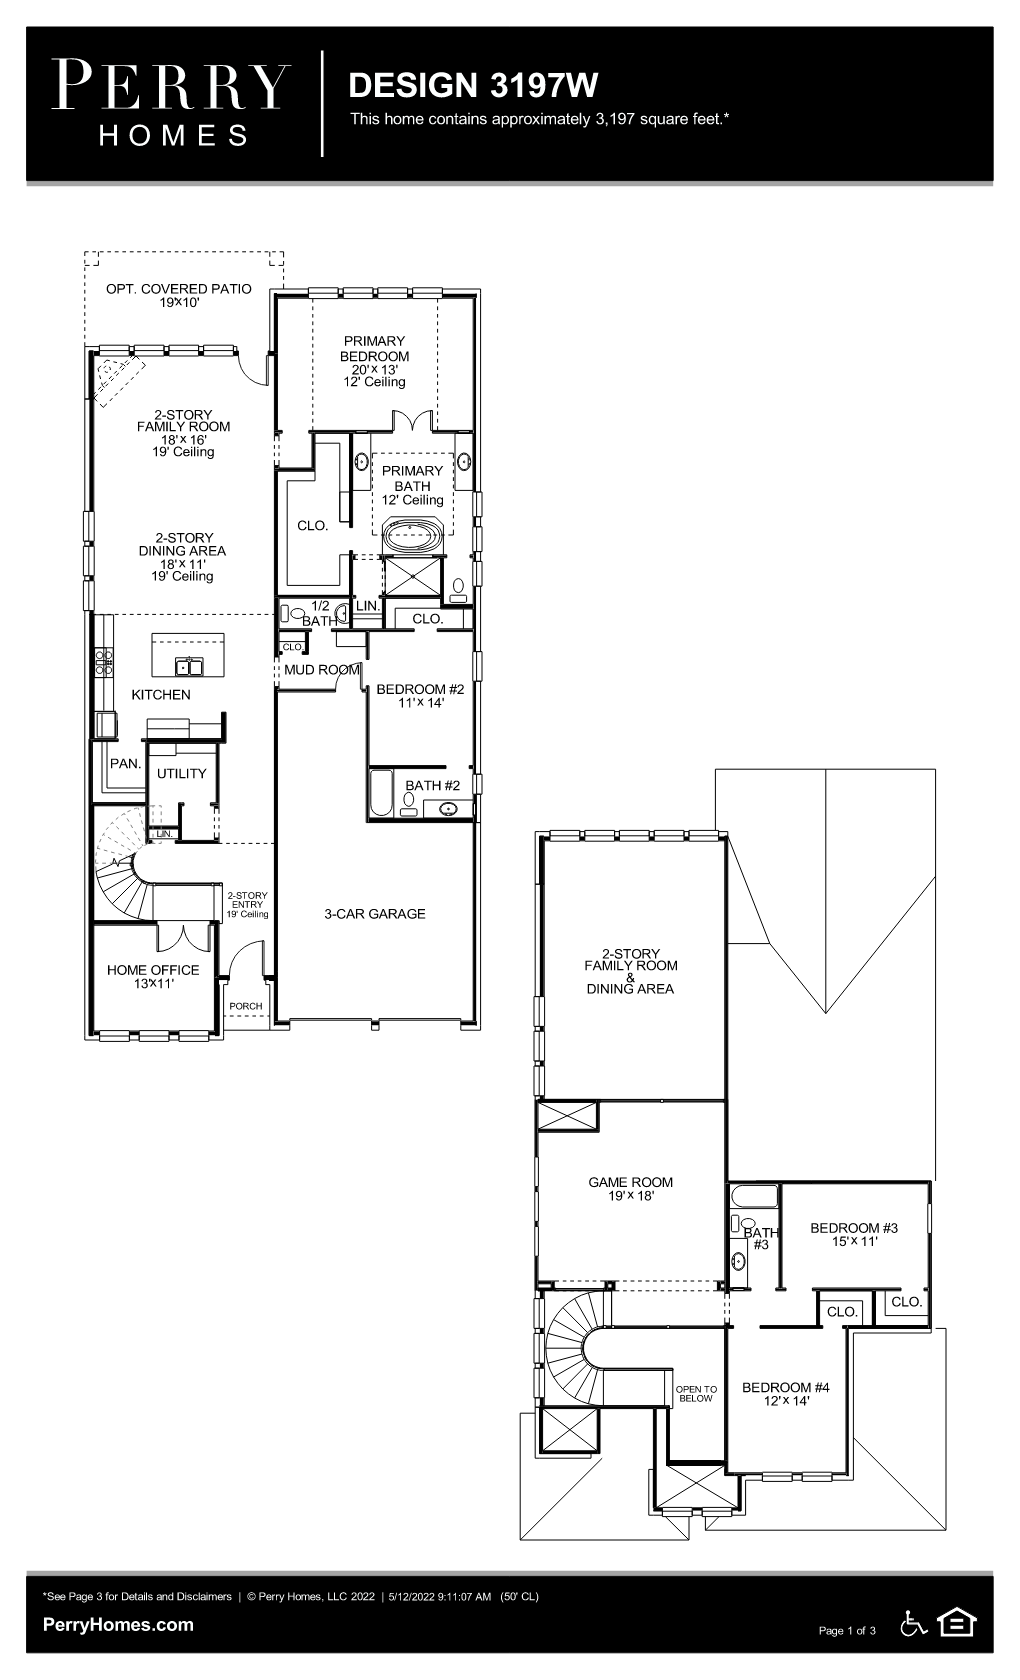 Floor Plan for 3197W